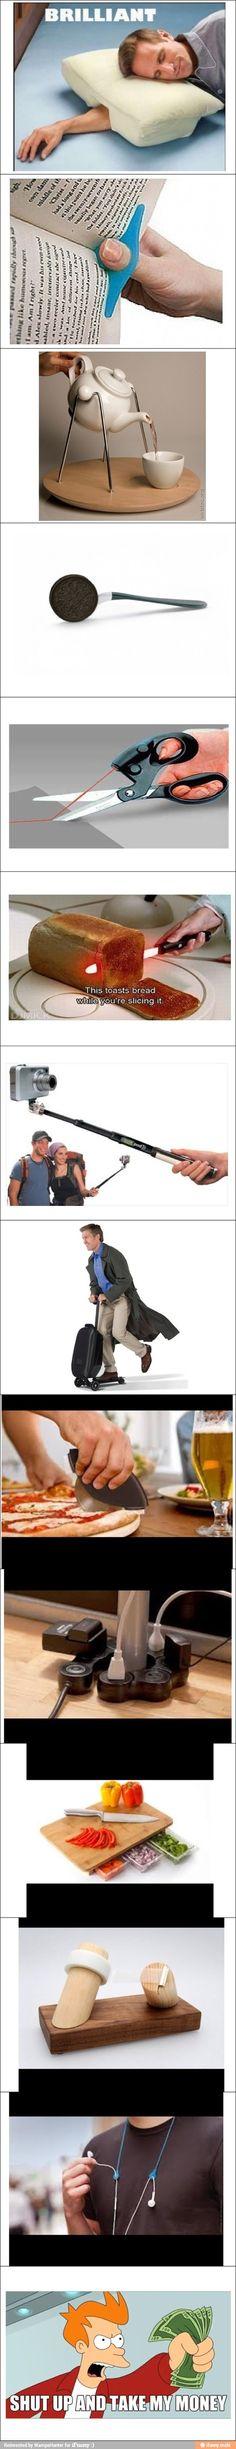 These are brilliant!